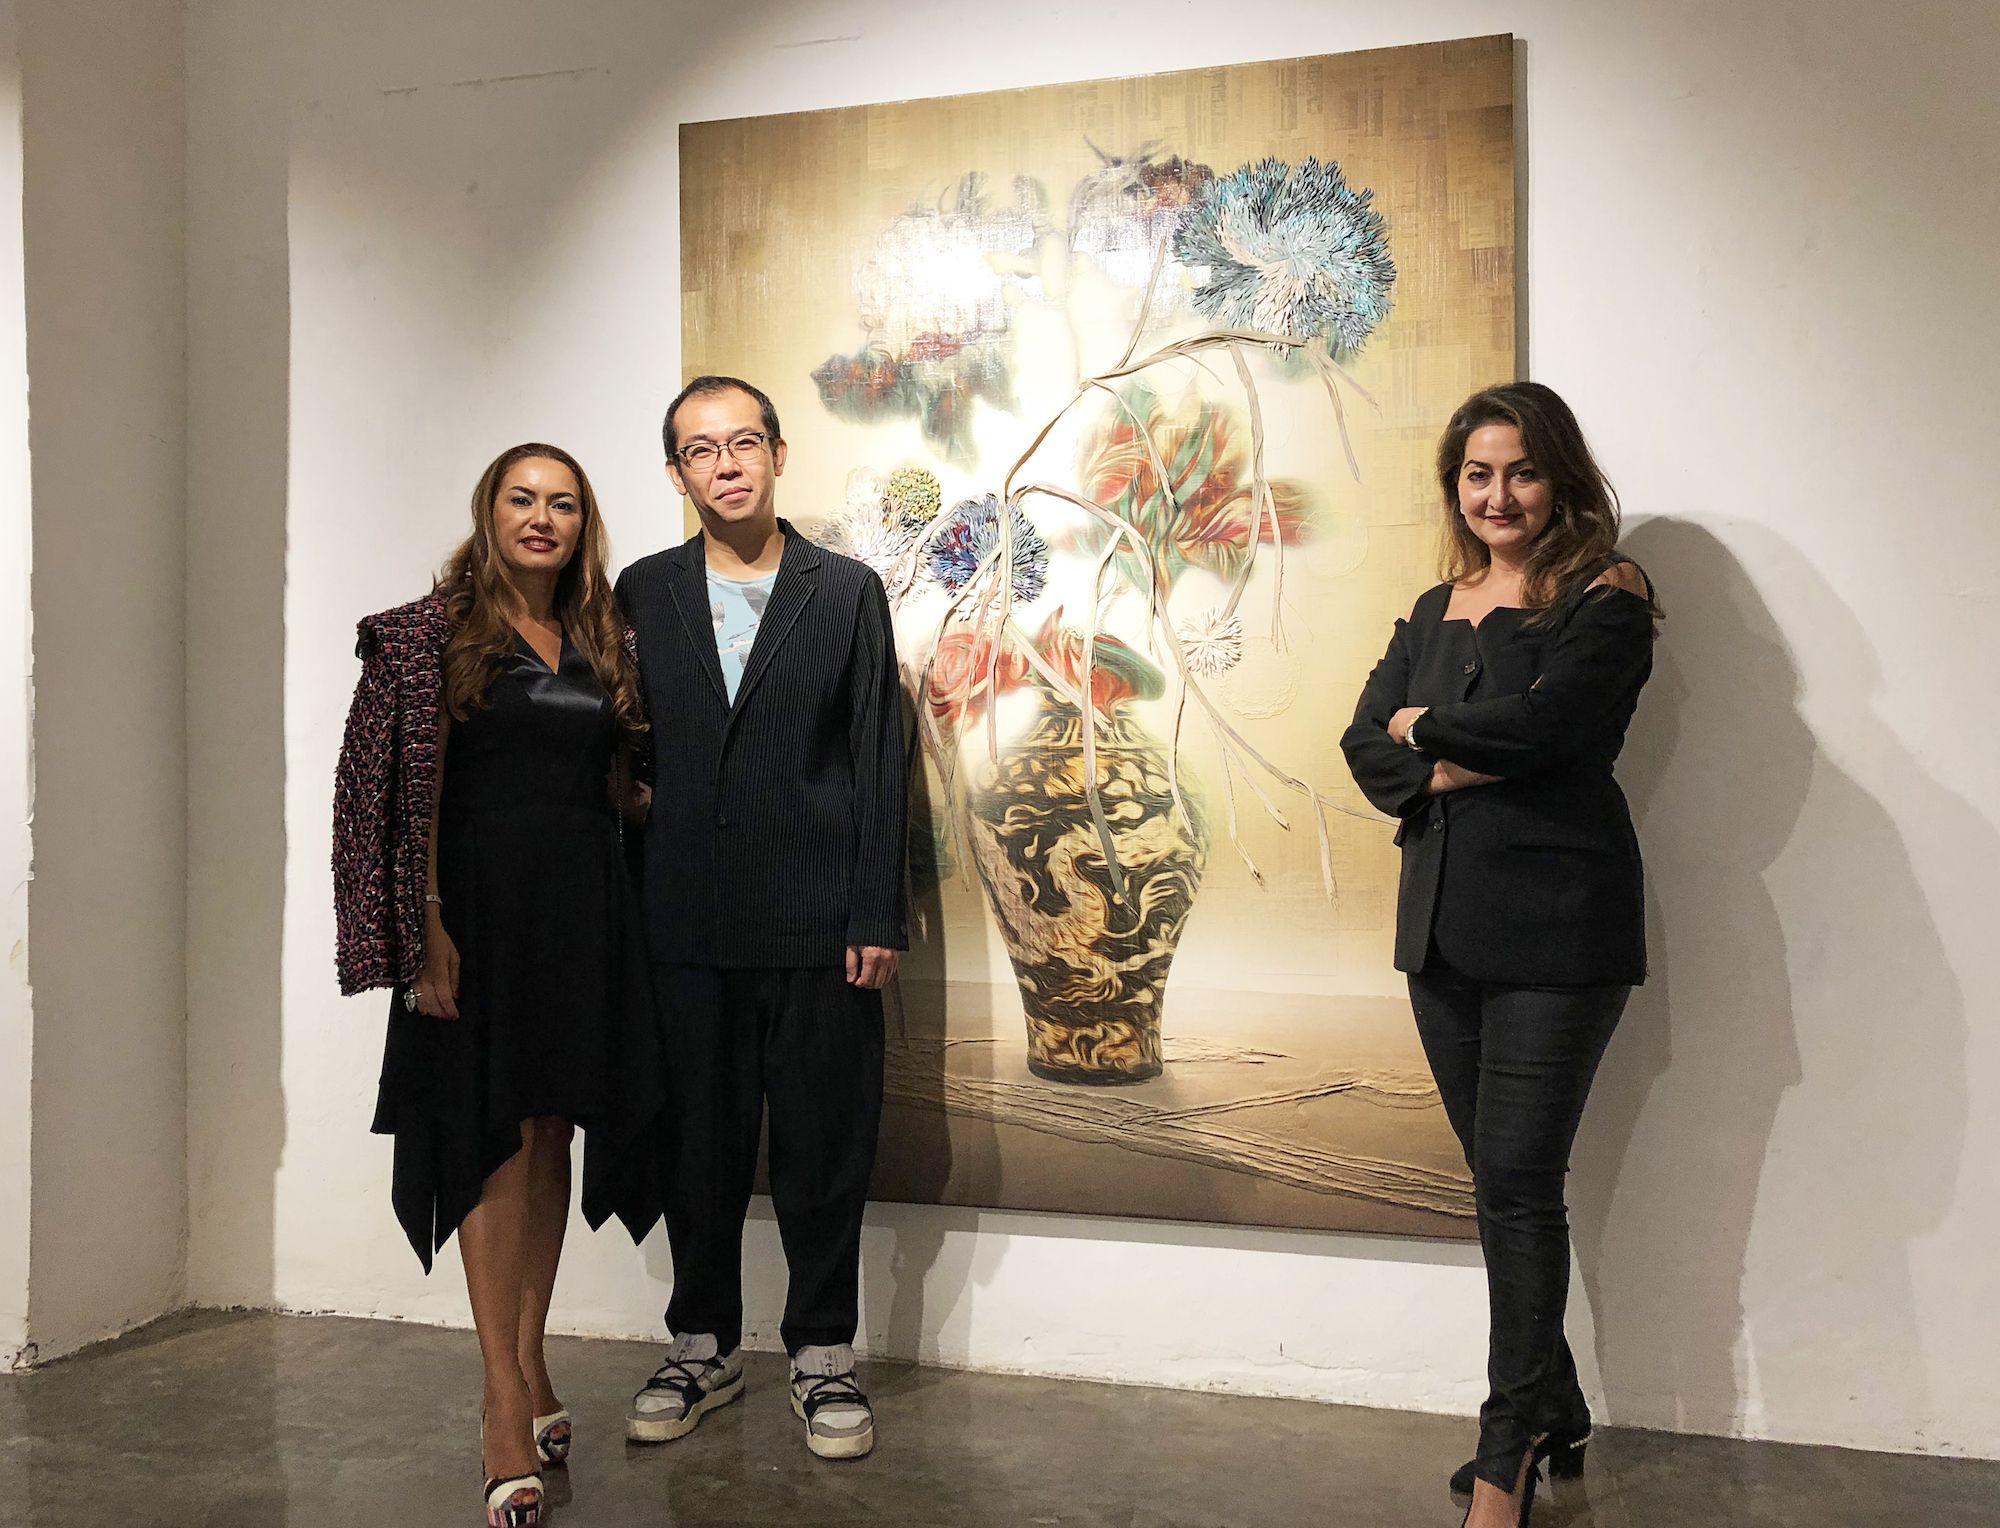 Aylin Suntay, Gordon Cheung, Yas Mostashari-Chang